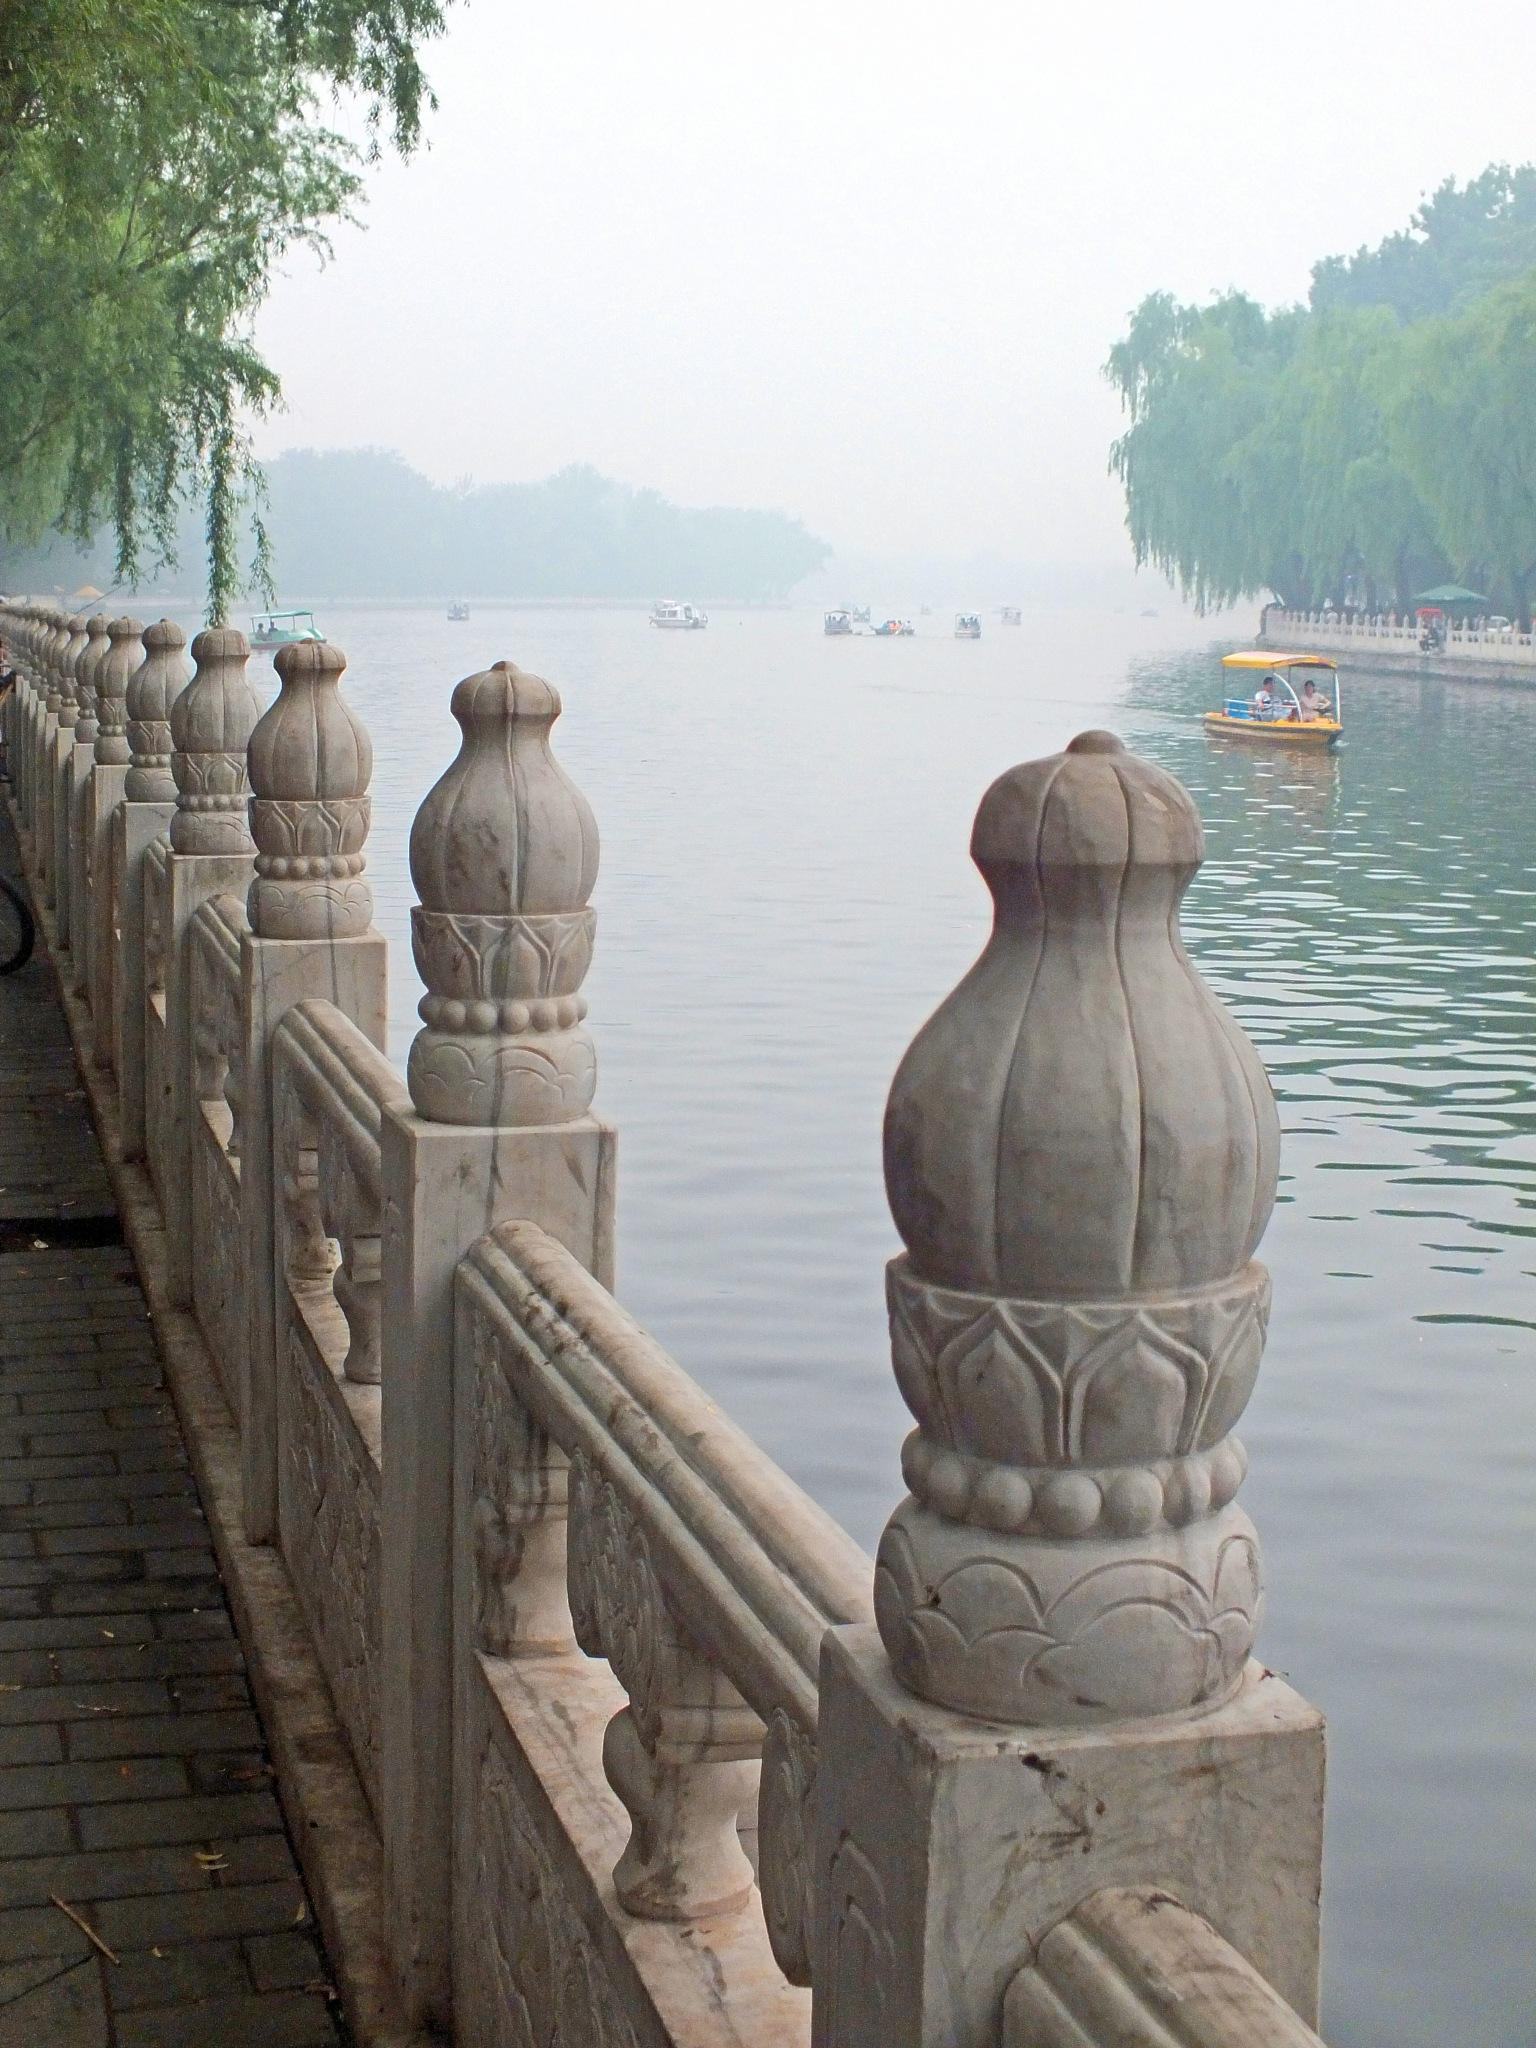 Houhai-Lake in Peking by Helga Kerner